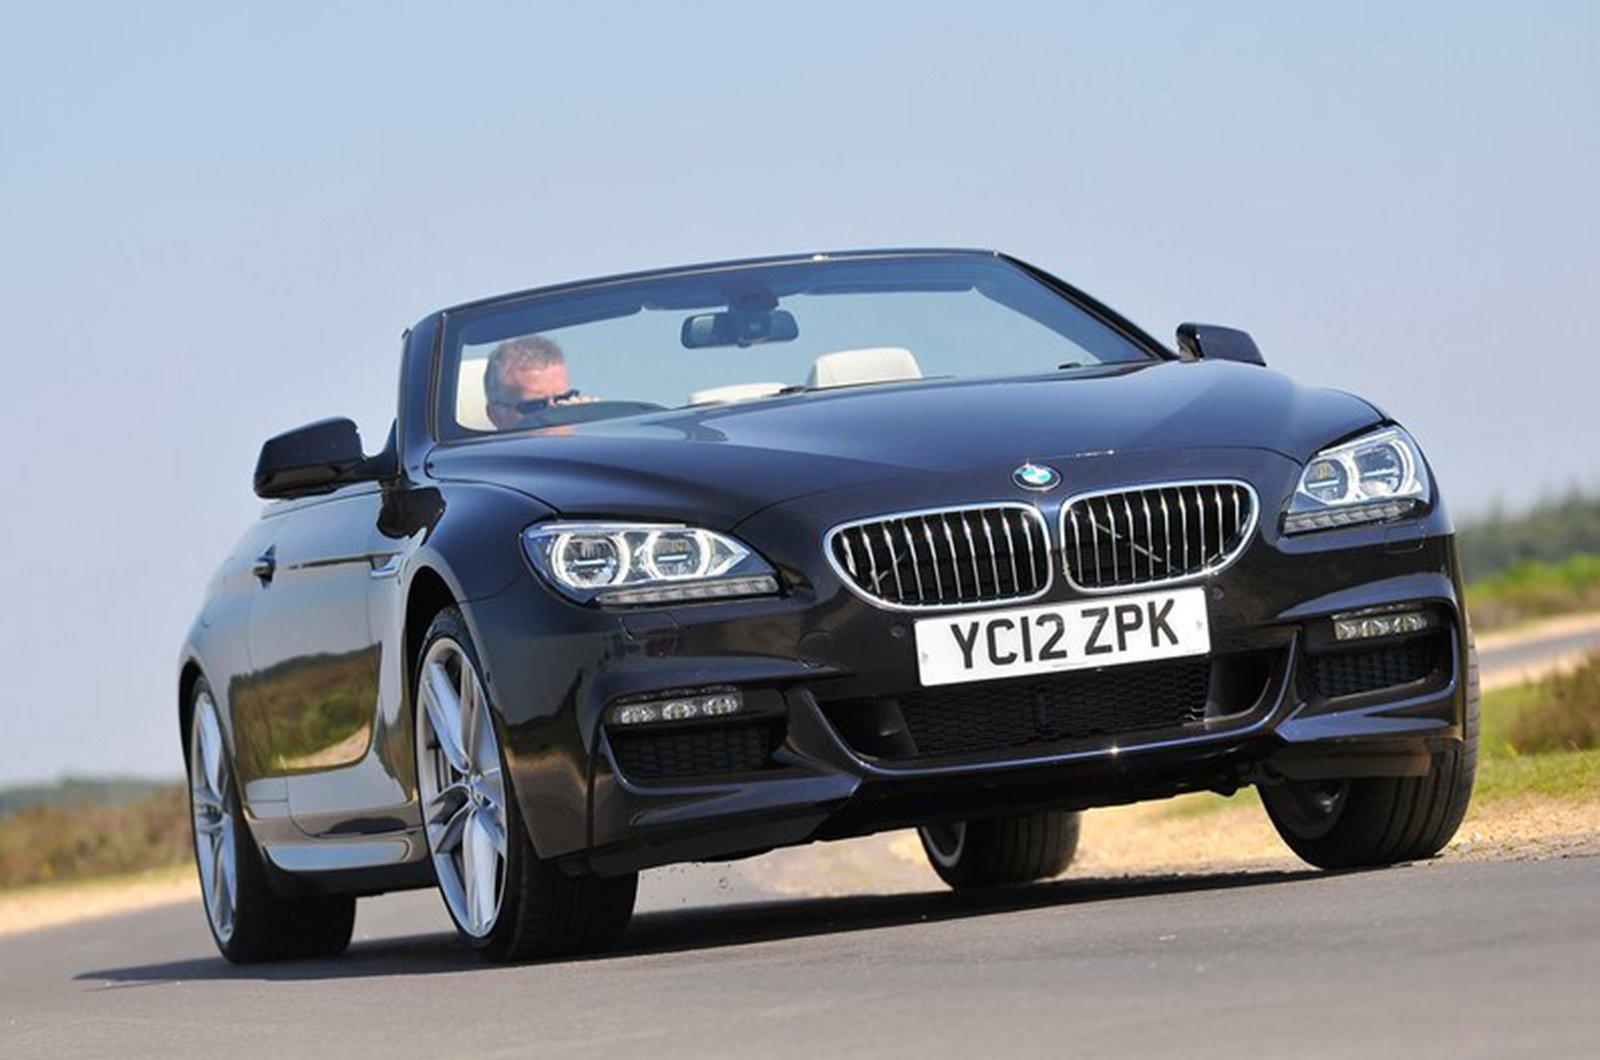 BMW 6 Series Convertible 11-18